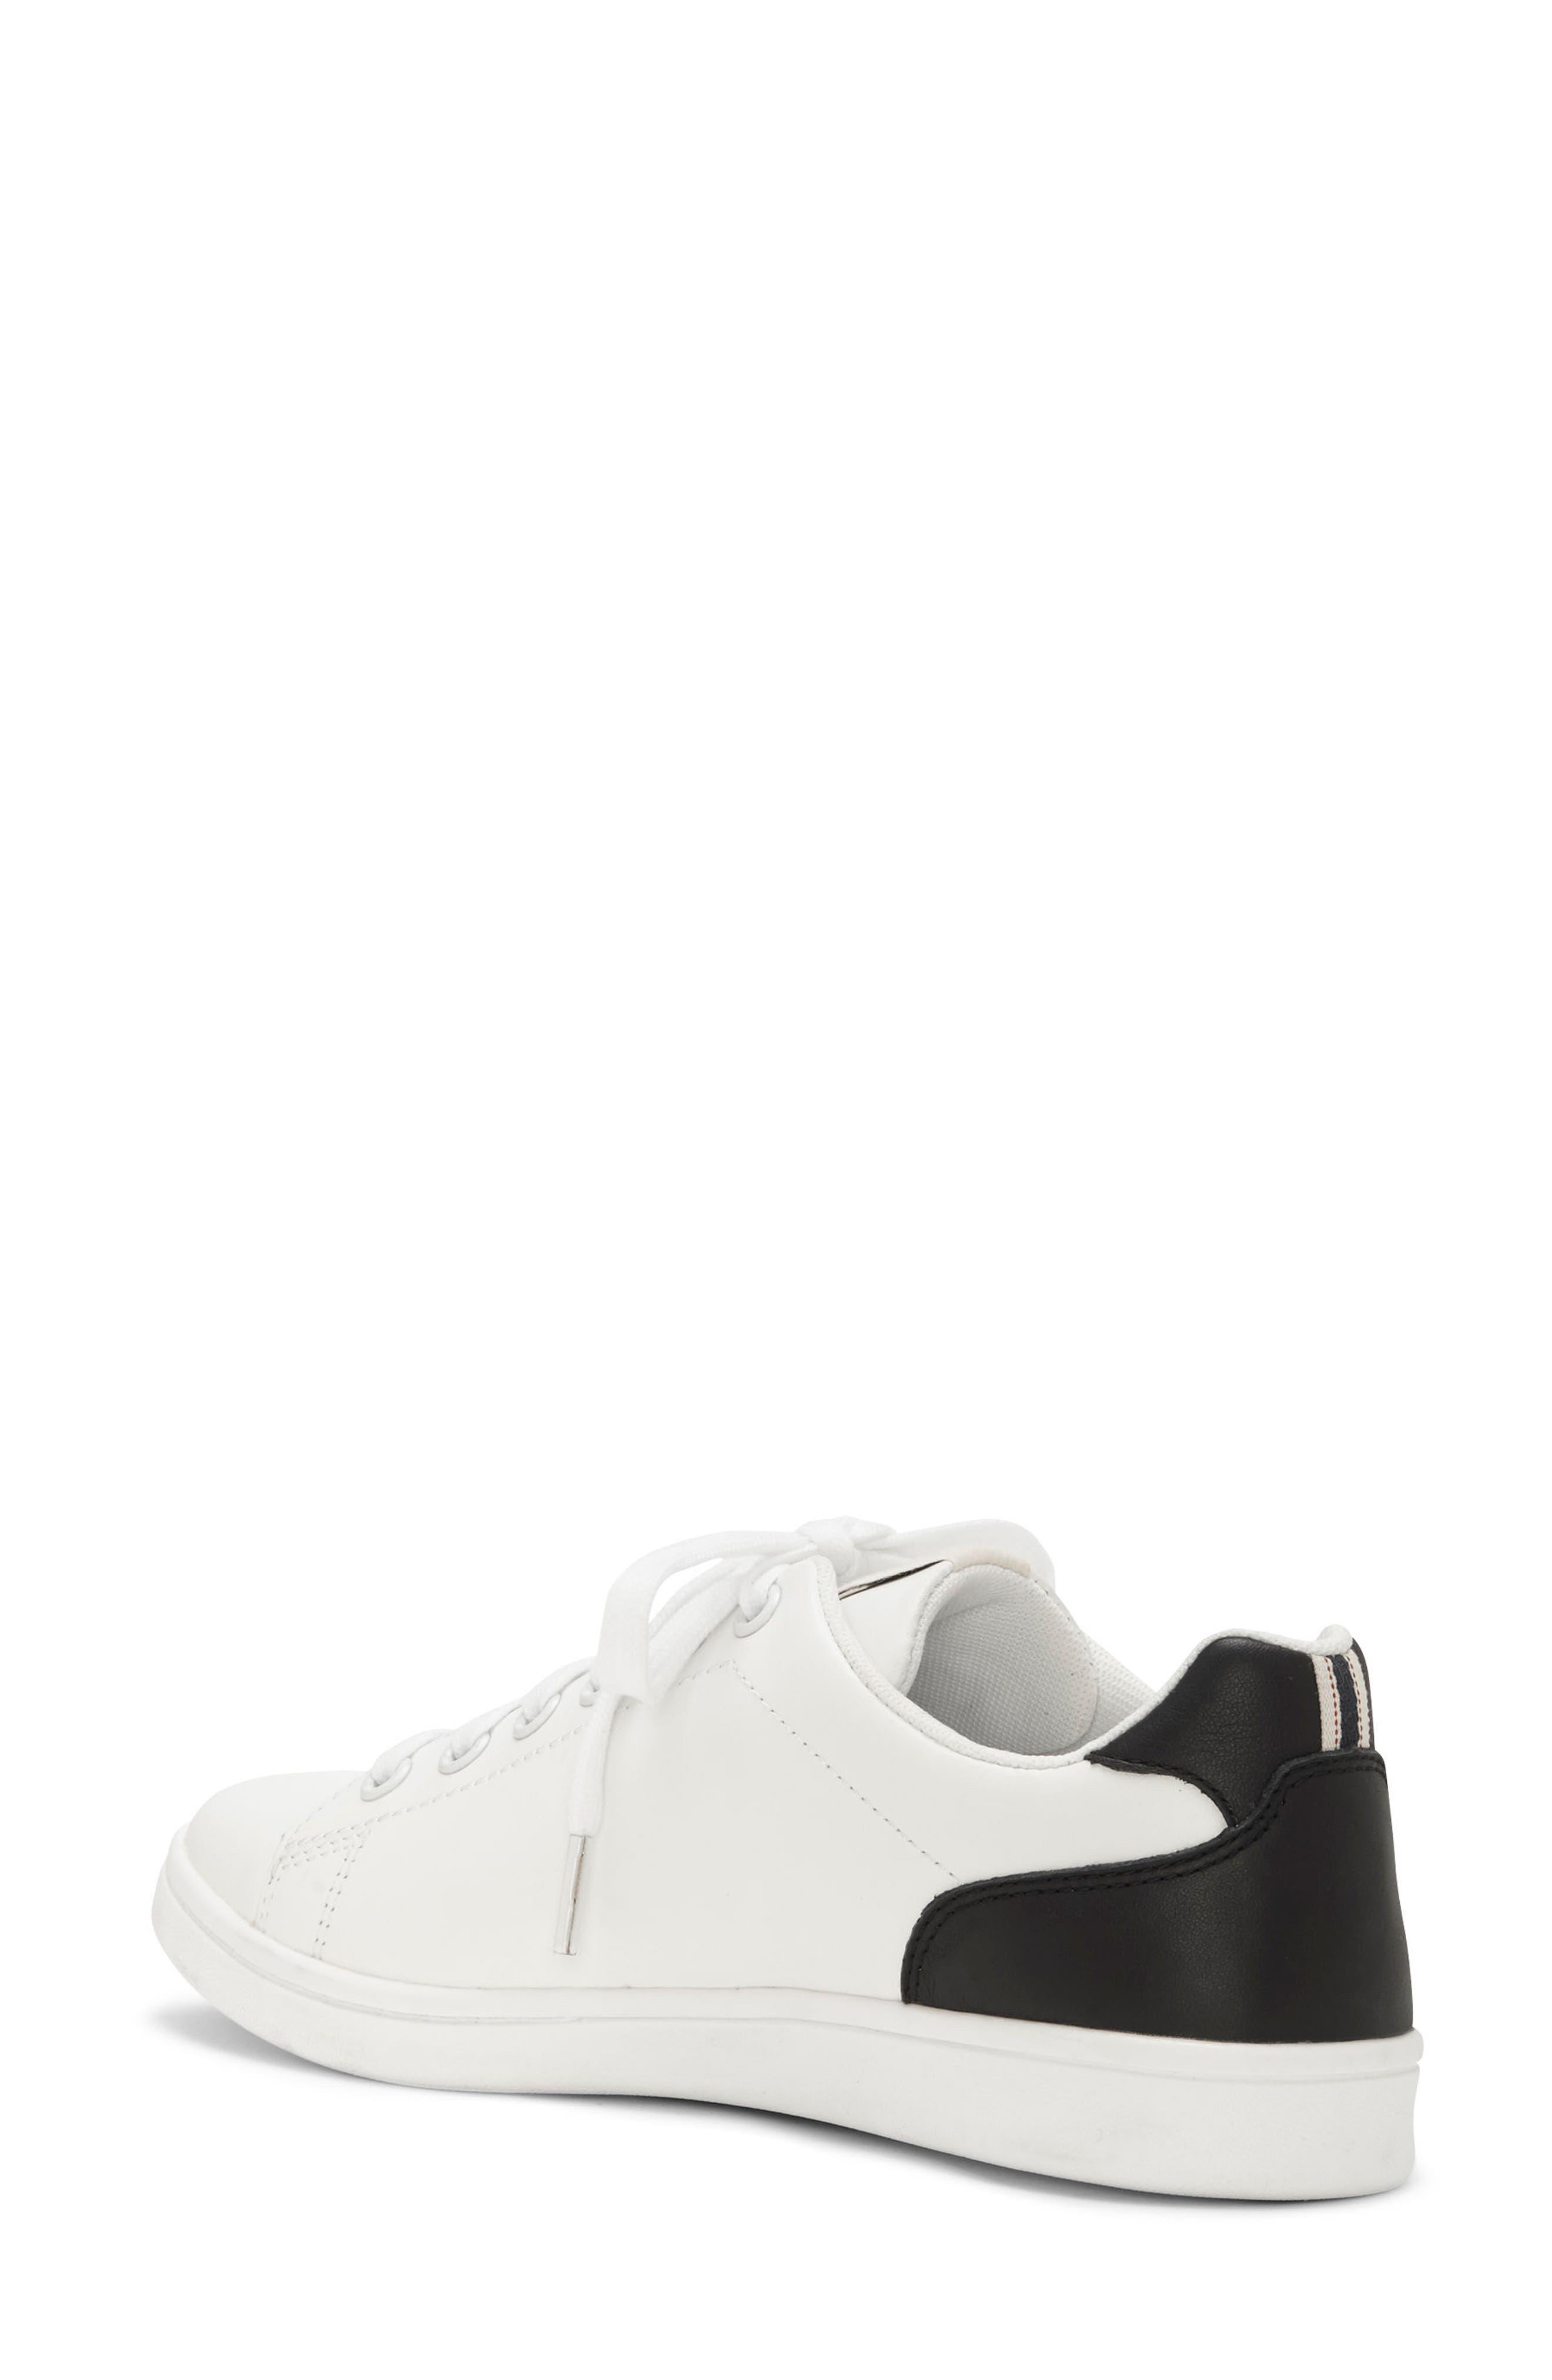 Chapanima Sneaker,                             Alternate thumbnail 5, color,